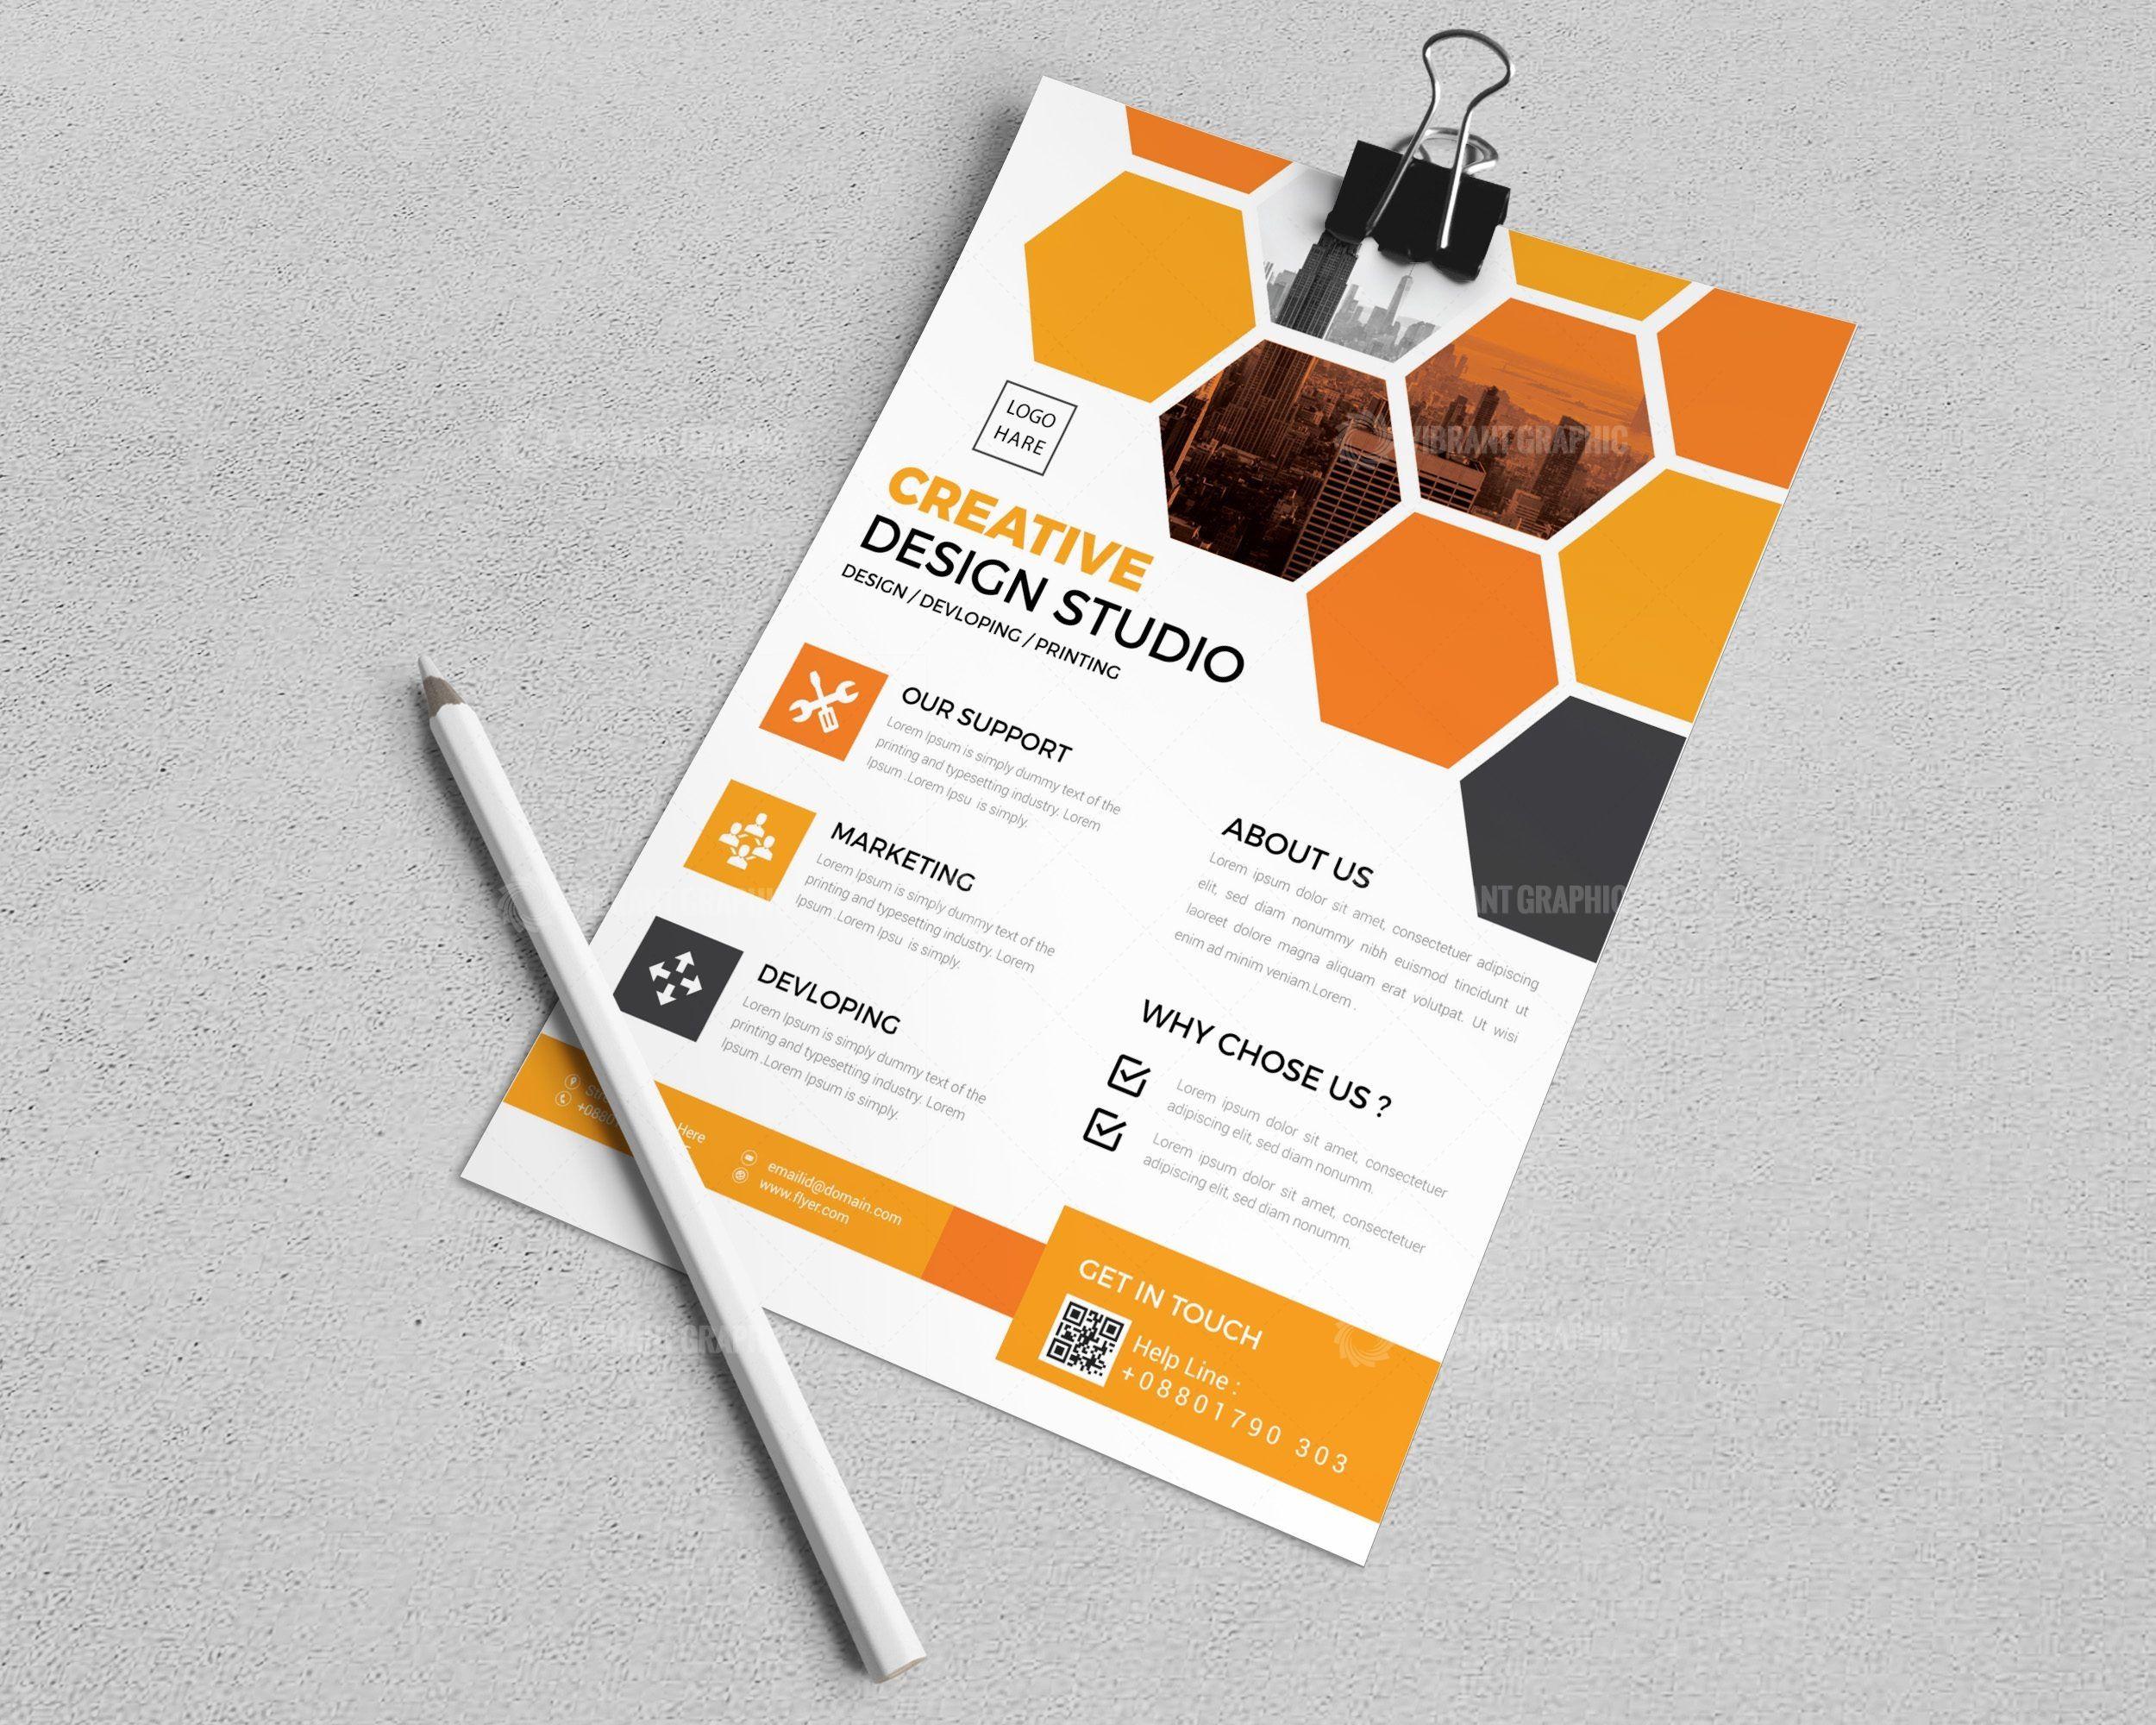 Manufacturing Flyer Templates 5 99 Businessflyer Businessflyerdesign Businessflyertemplate Graphic Design Templates Flyer Templates Flyer And Poster Design